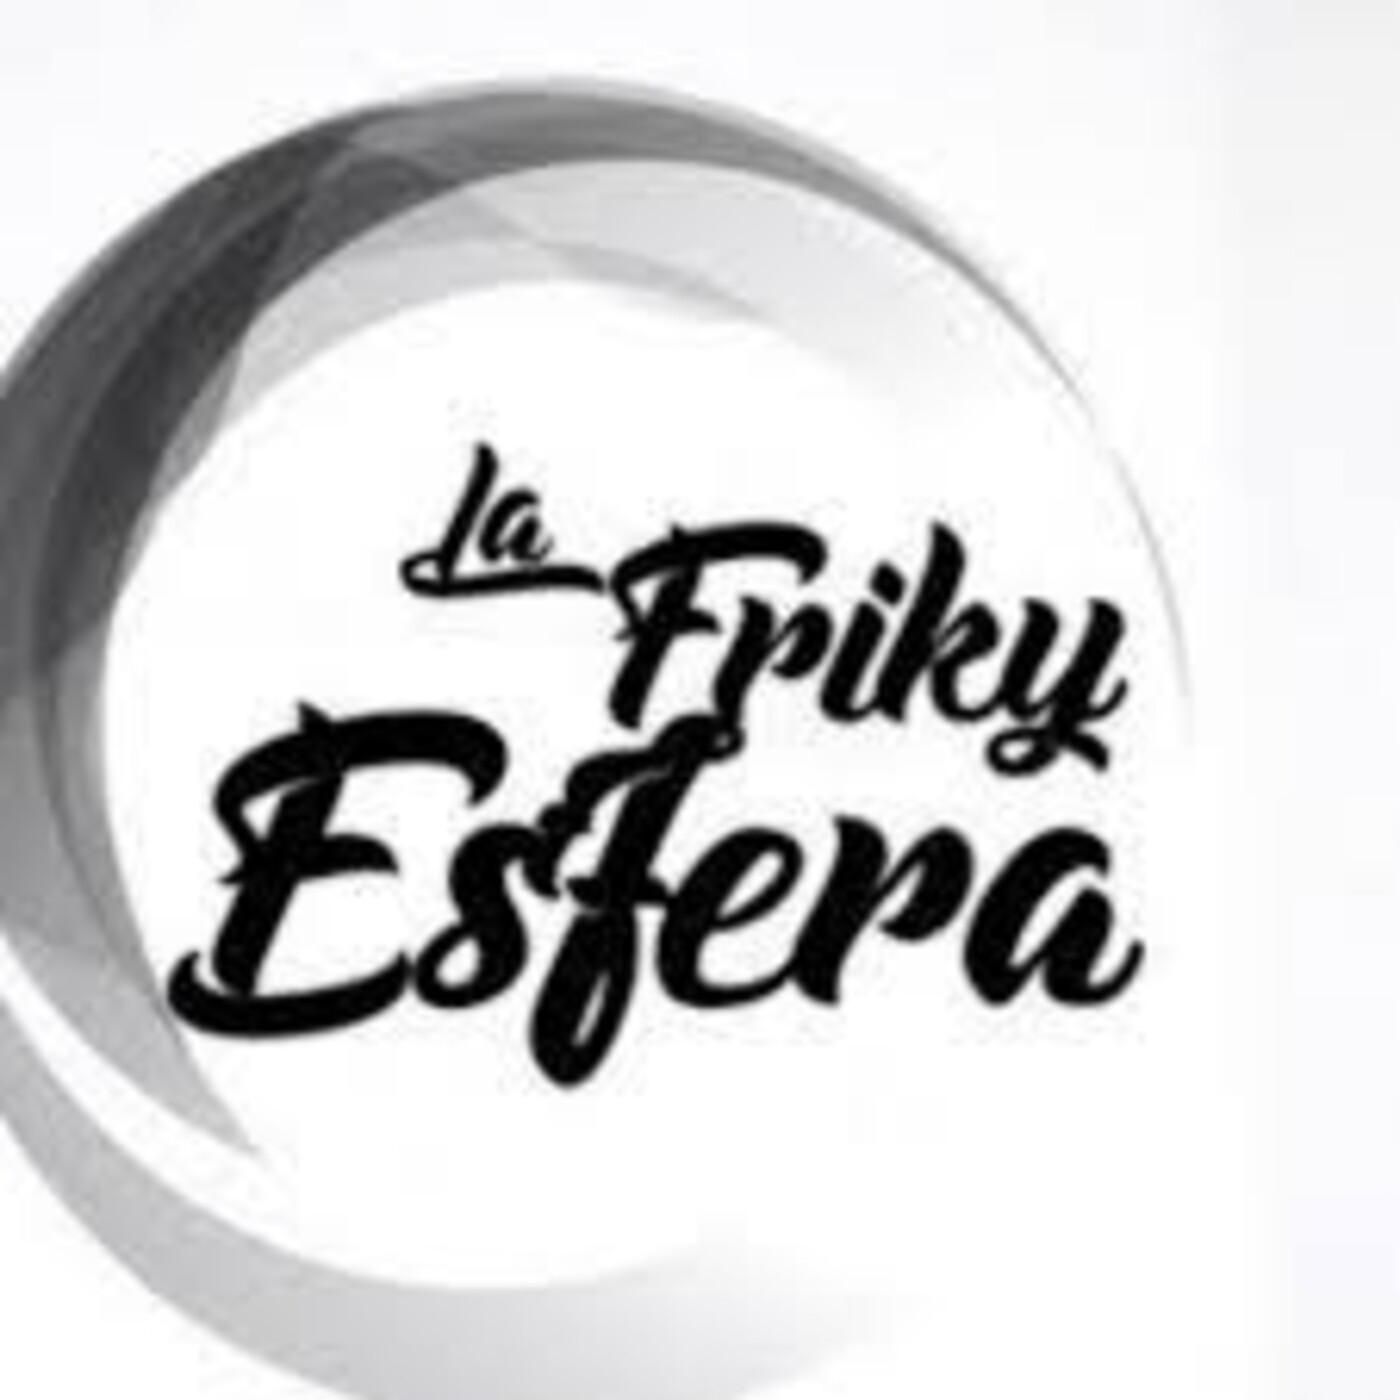 49º Friky Esfera